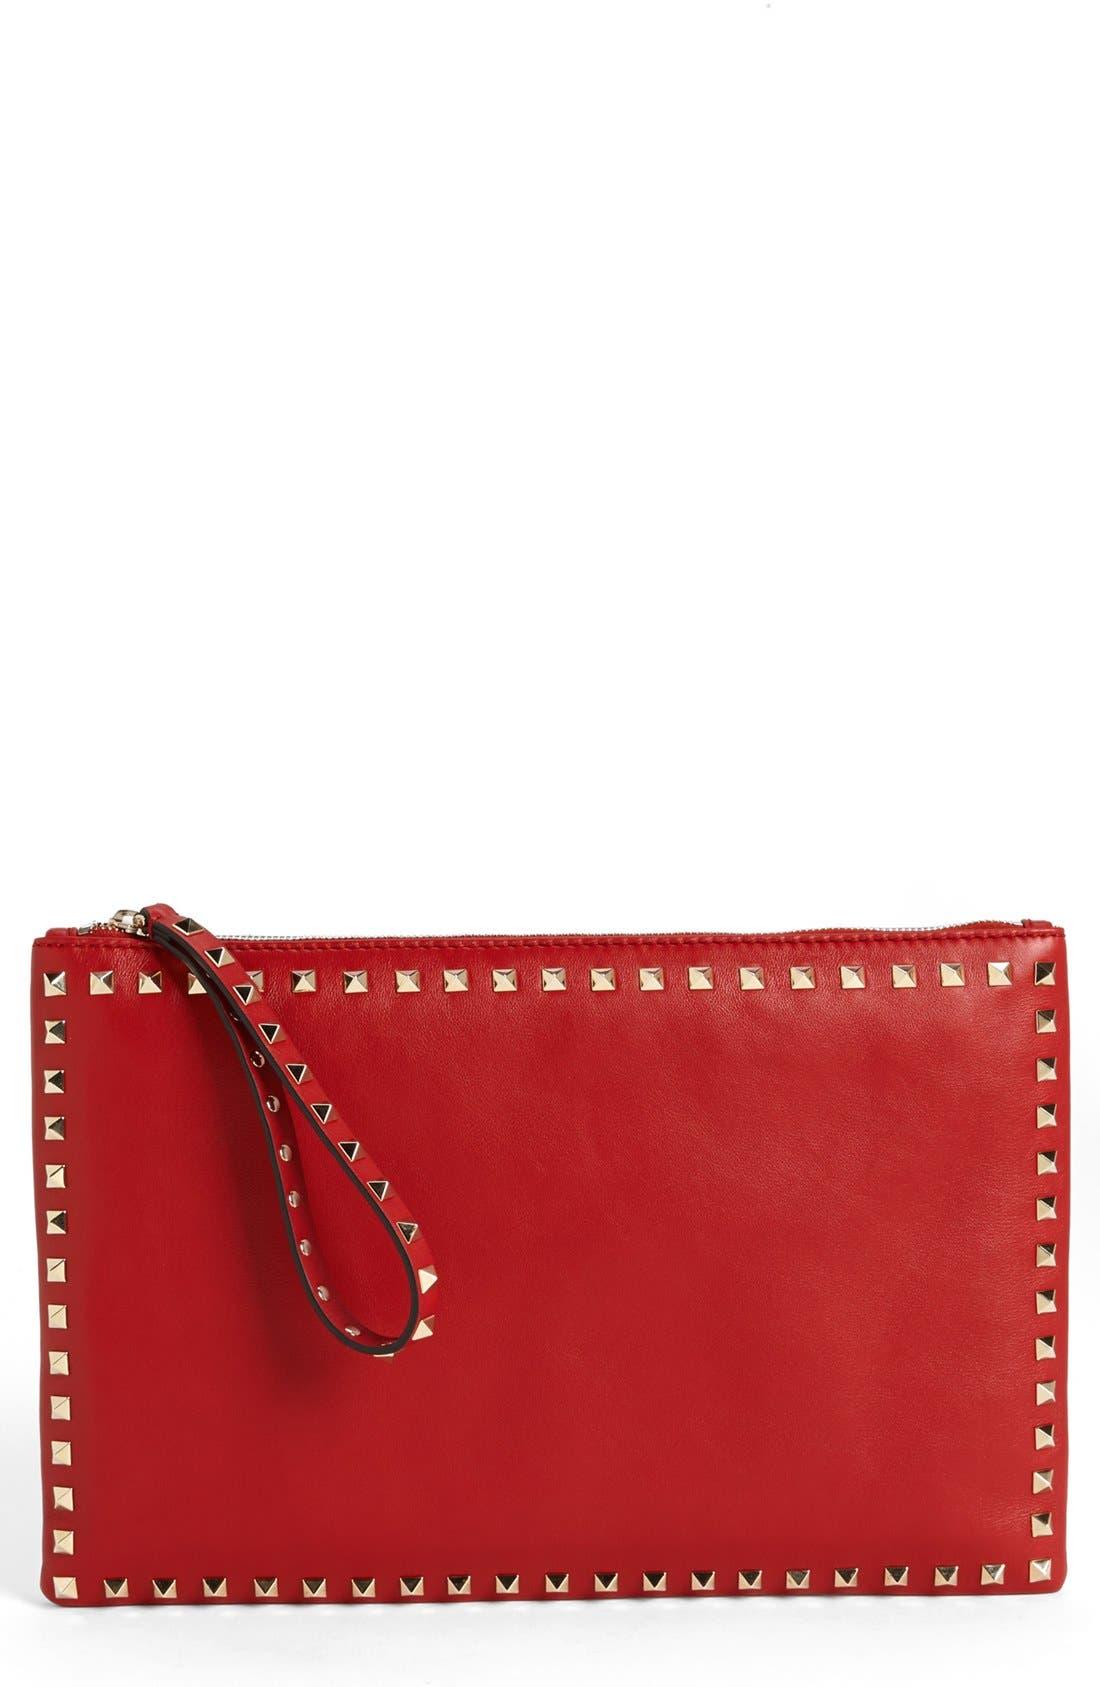 Main Image - Valentino 'Rockstud - Flat' Nappa Leather Clutch